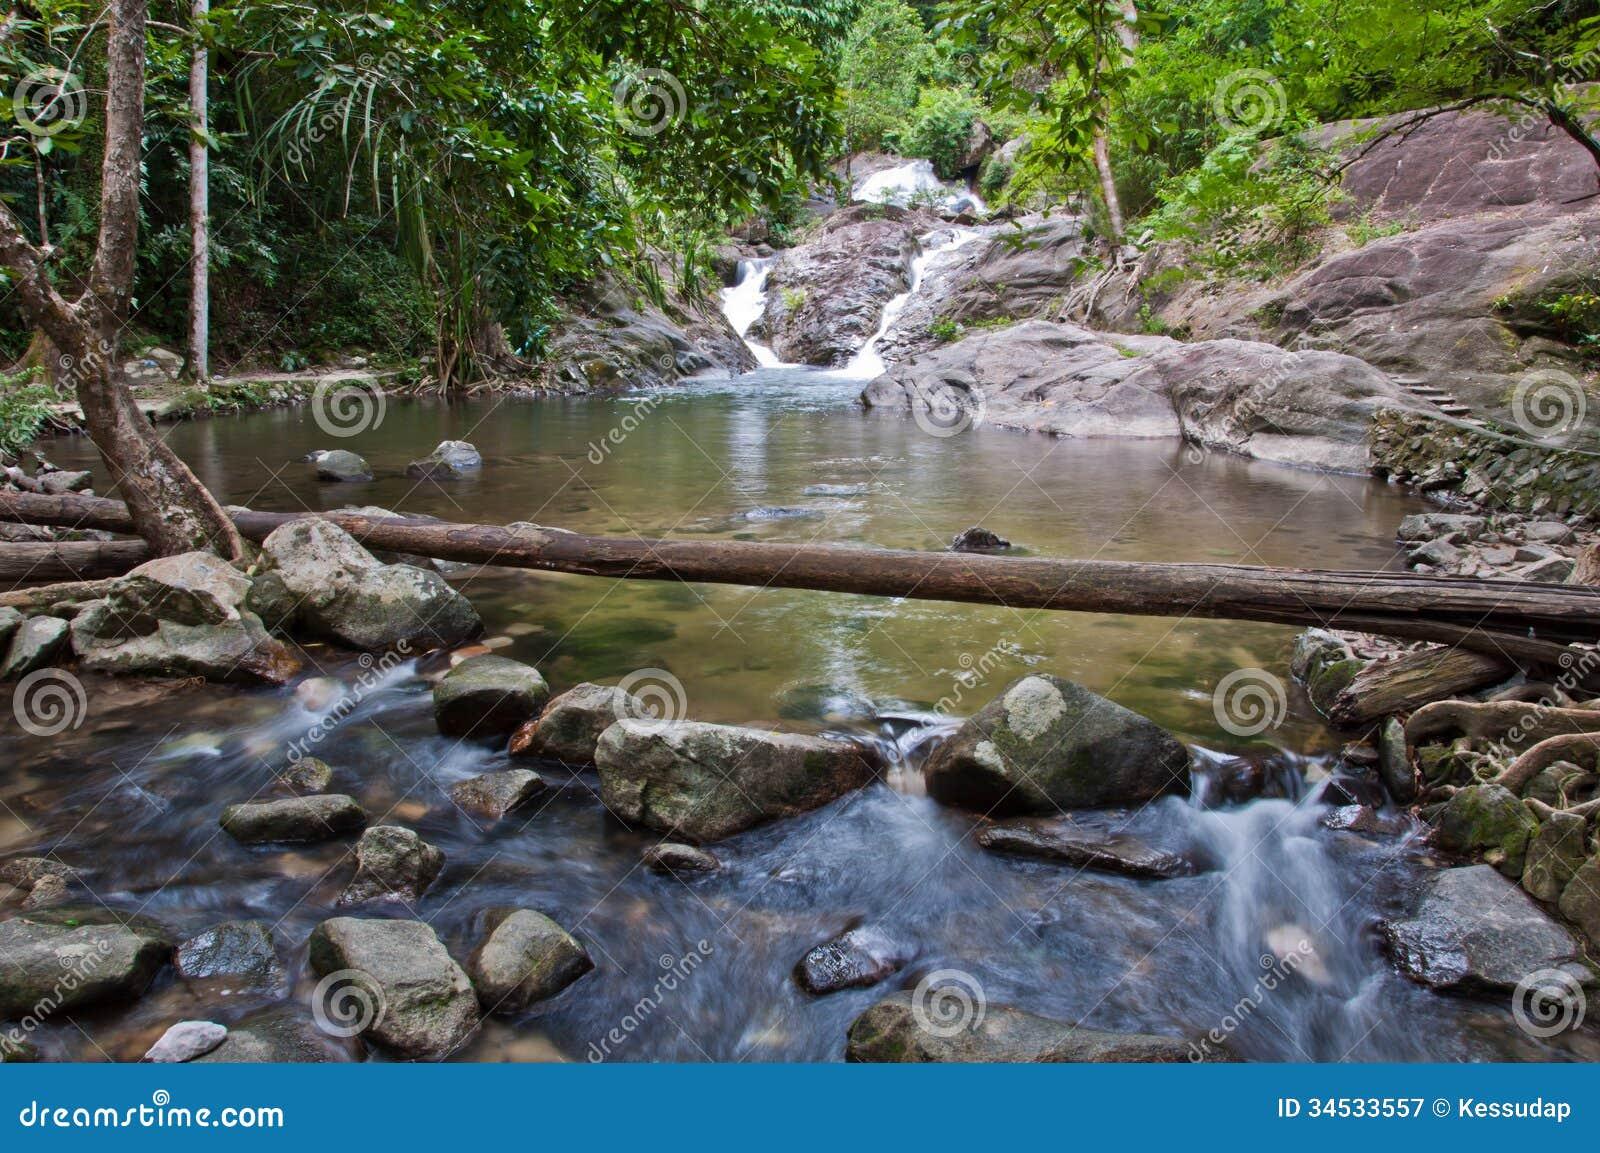 Borripat Waterfall In Satun Thailand Royalty Free Stock